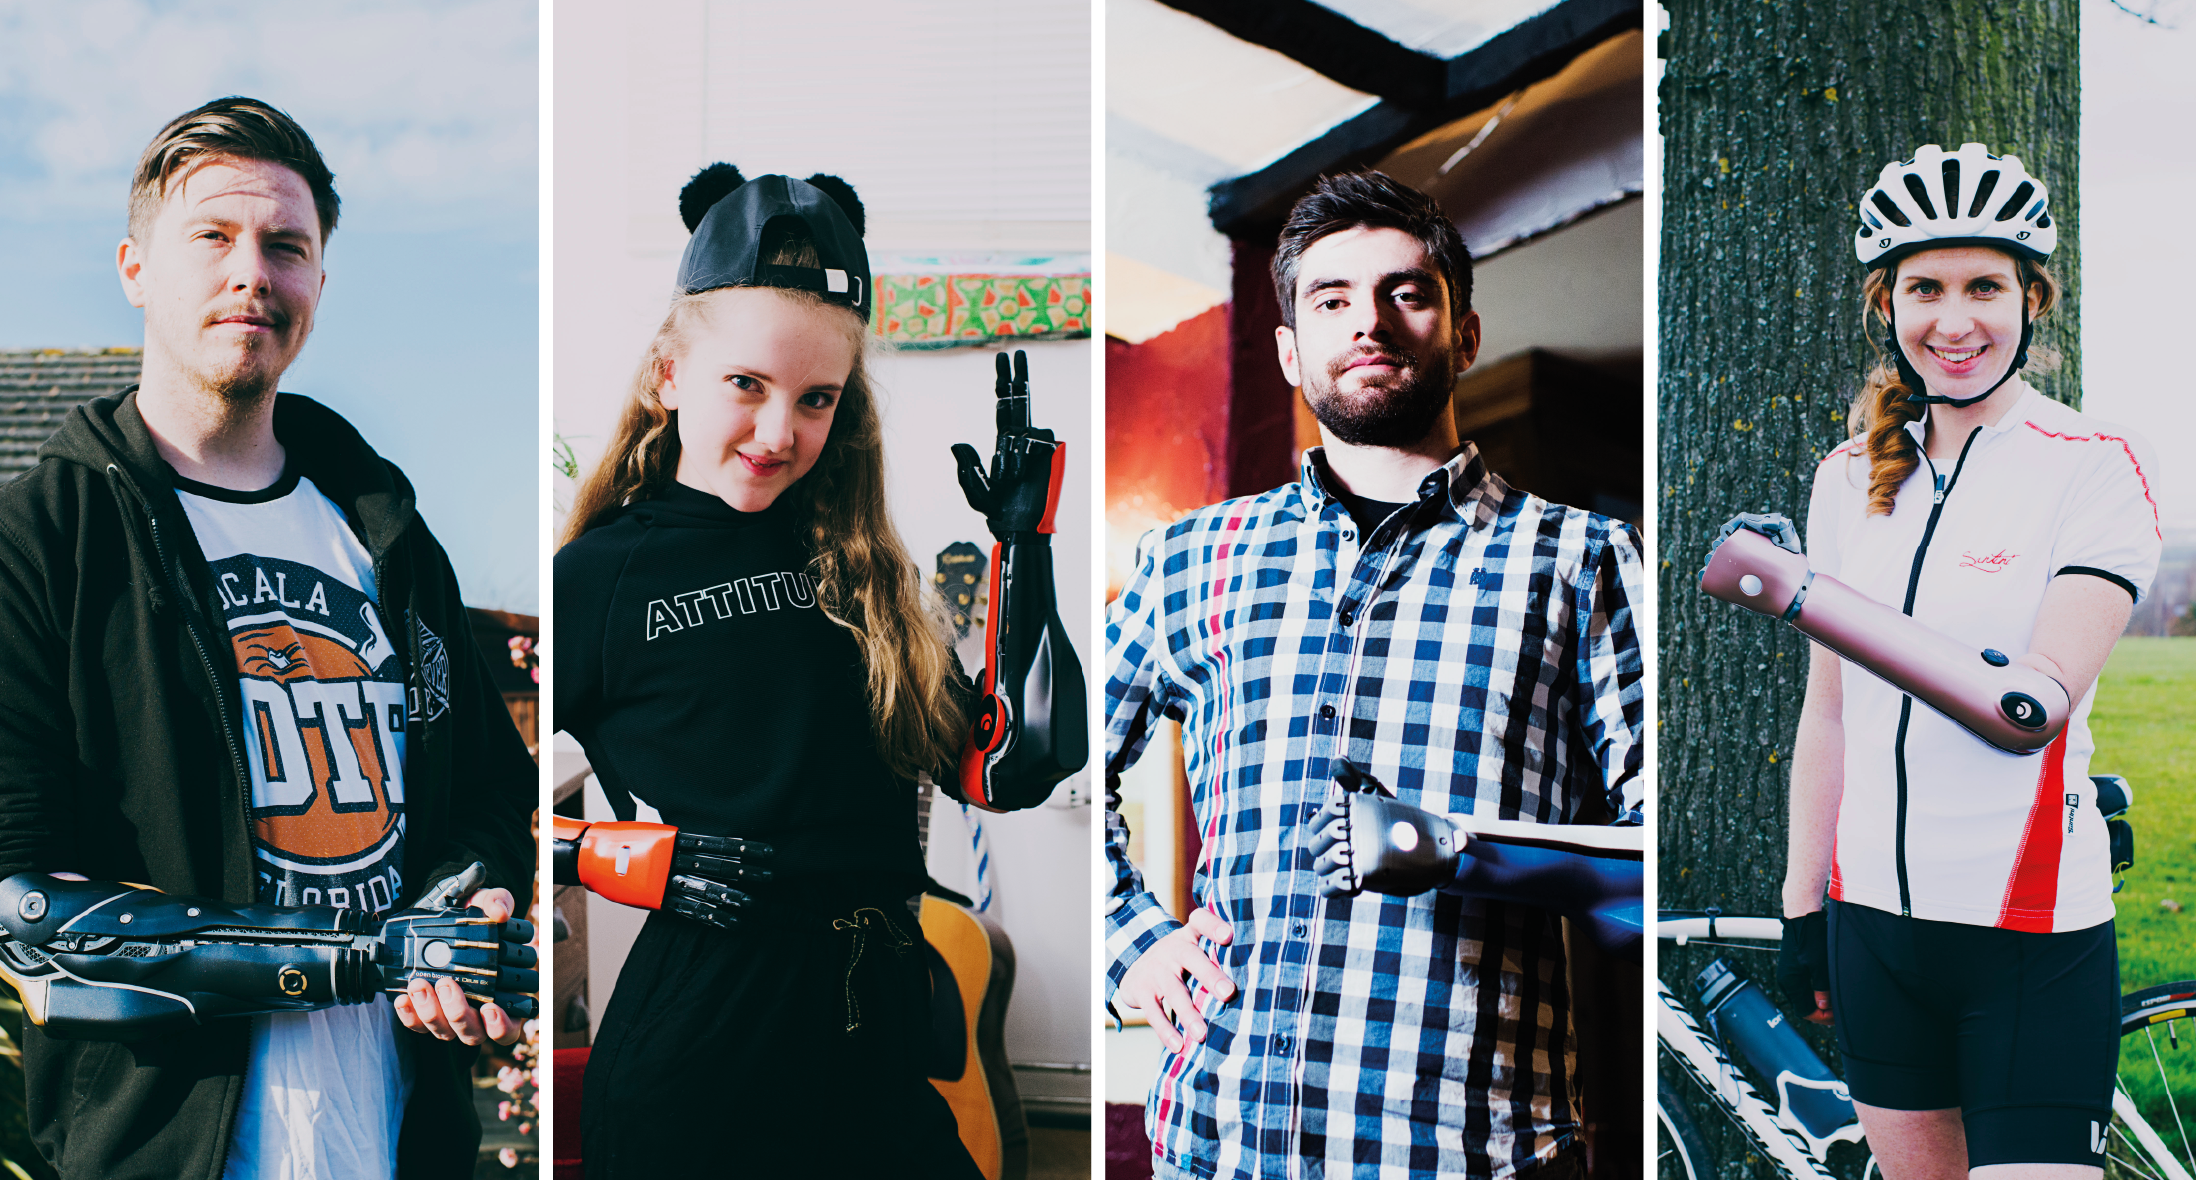 Open Bionics ambassadors - Dan, Tilly, Luke and Kate